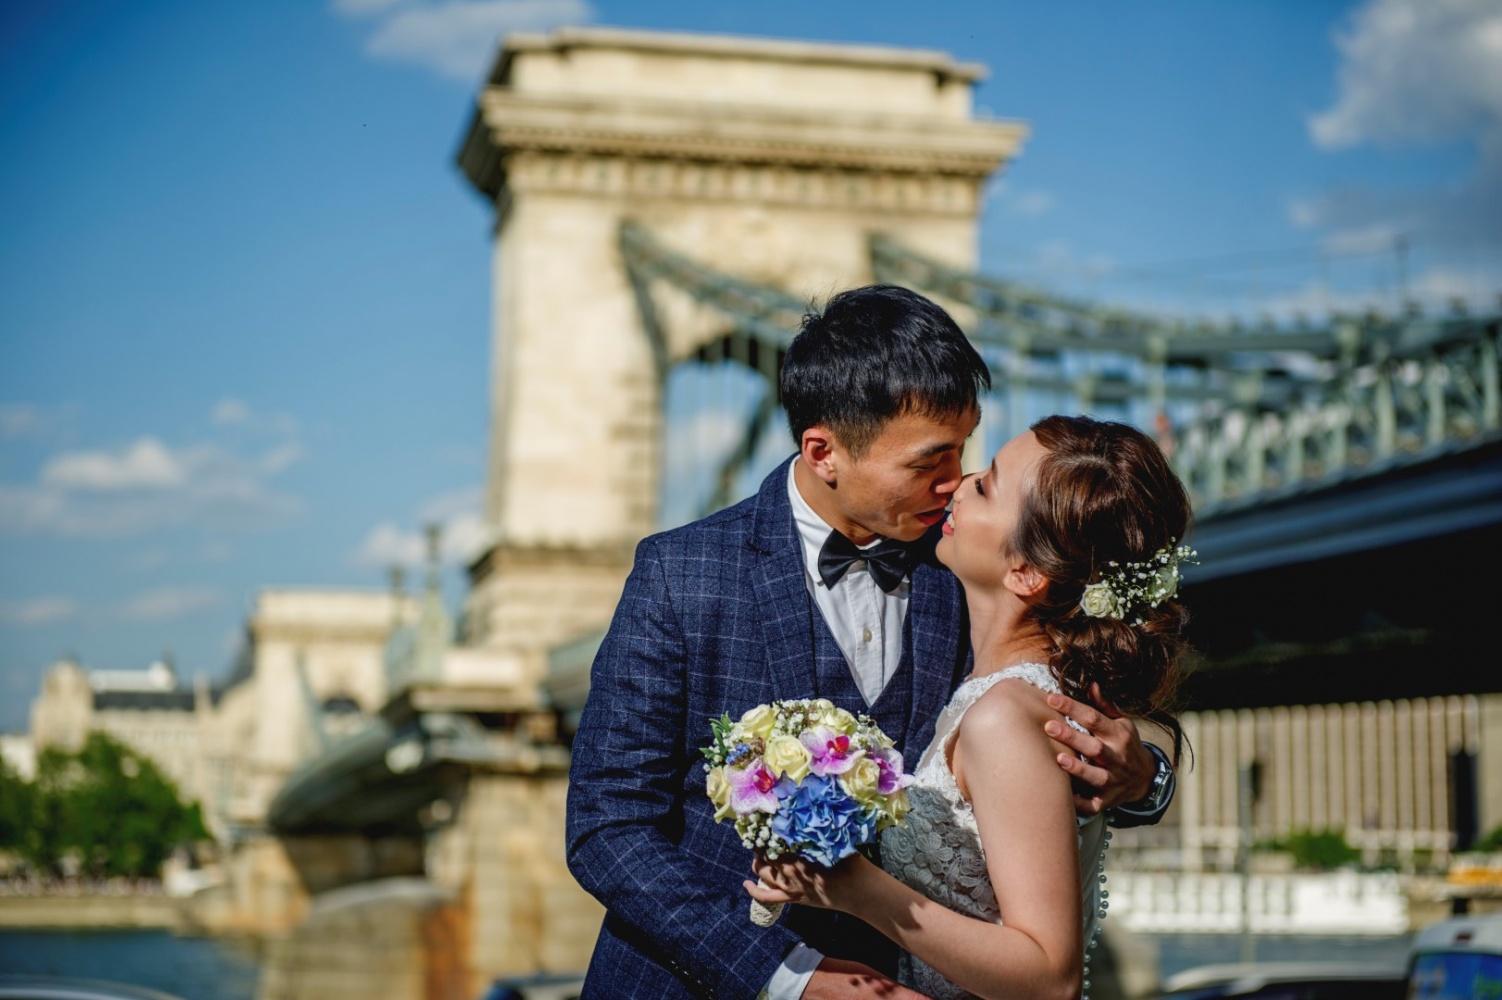 http://www.fotoz.sk/images/gallery-43/normal/svadobny-fotograf_svadobne-fotky_prewedding-budapest_juraj-zsok_eskuvoi-fotos_eskuvoi-fotozas_004.jpg